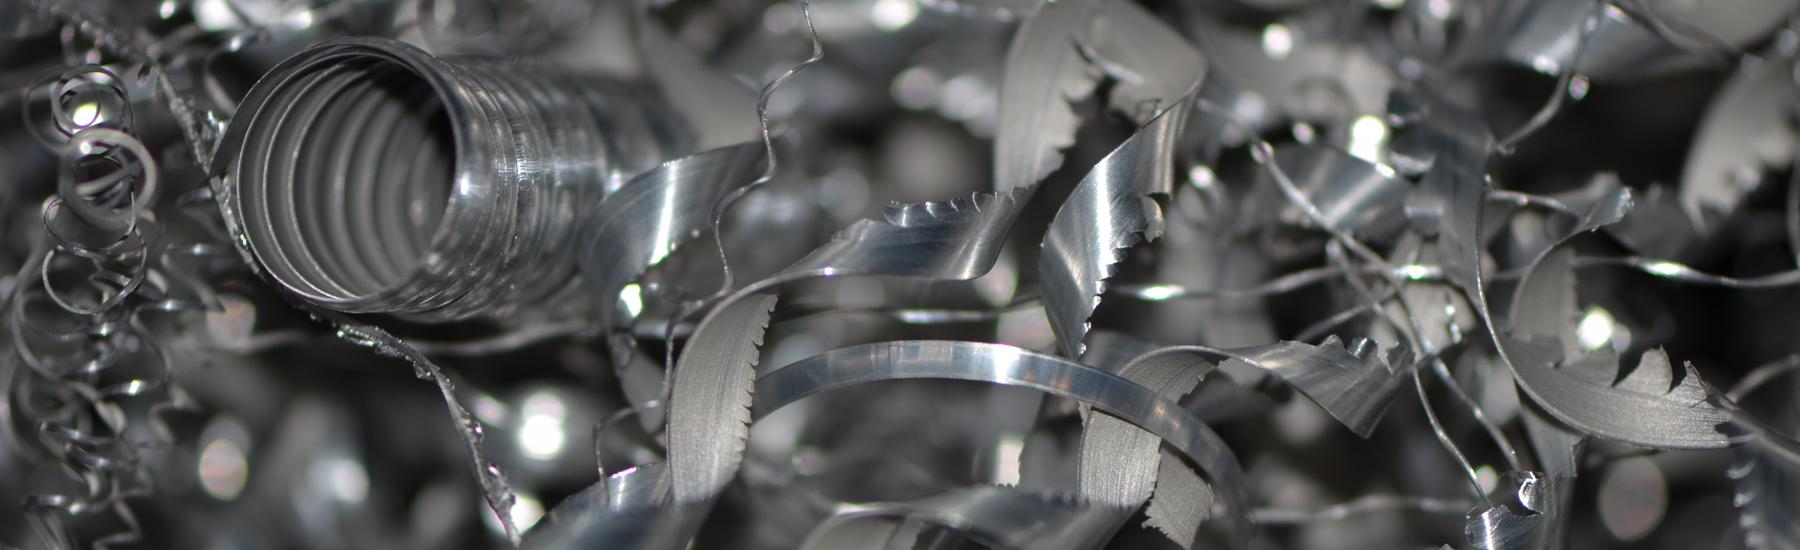 Slider-Metall Permoser Metall- und Palettenhandel GmbH Tirol